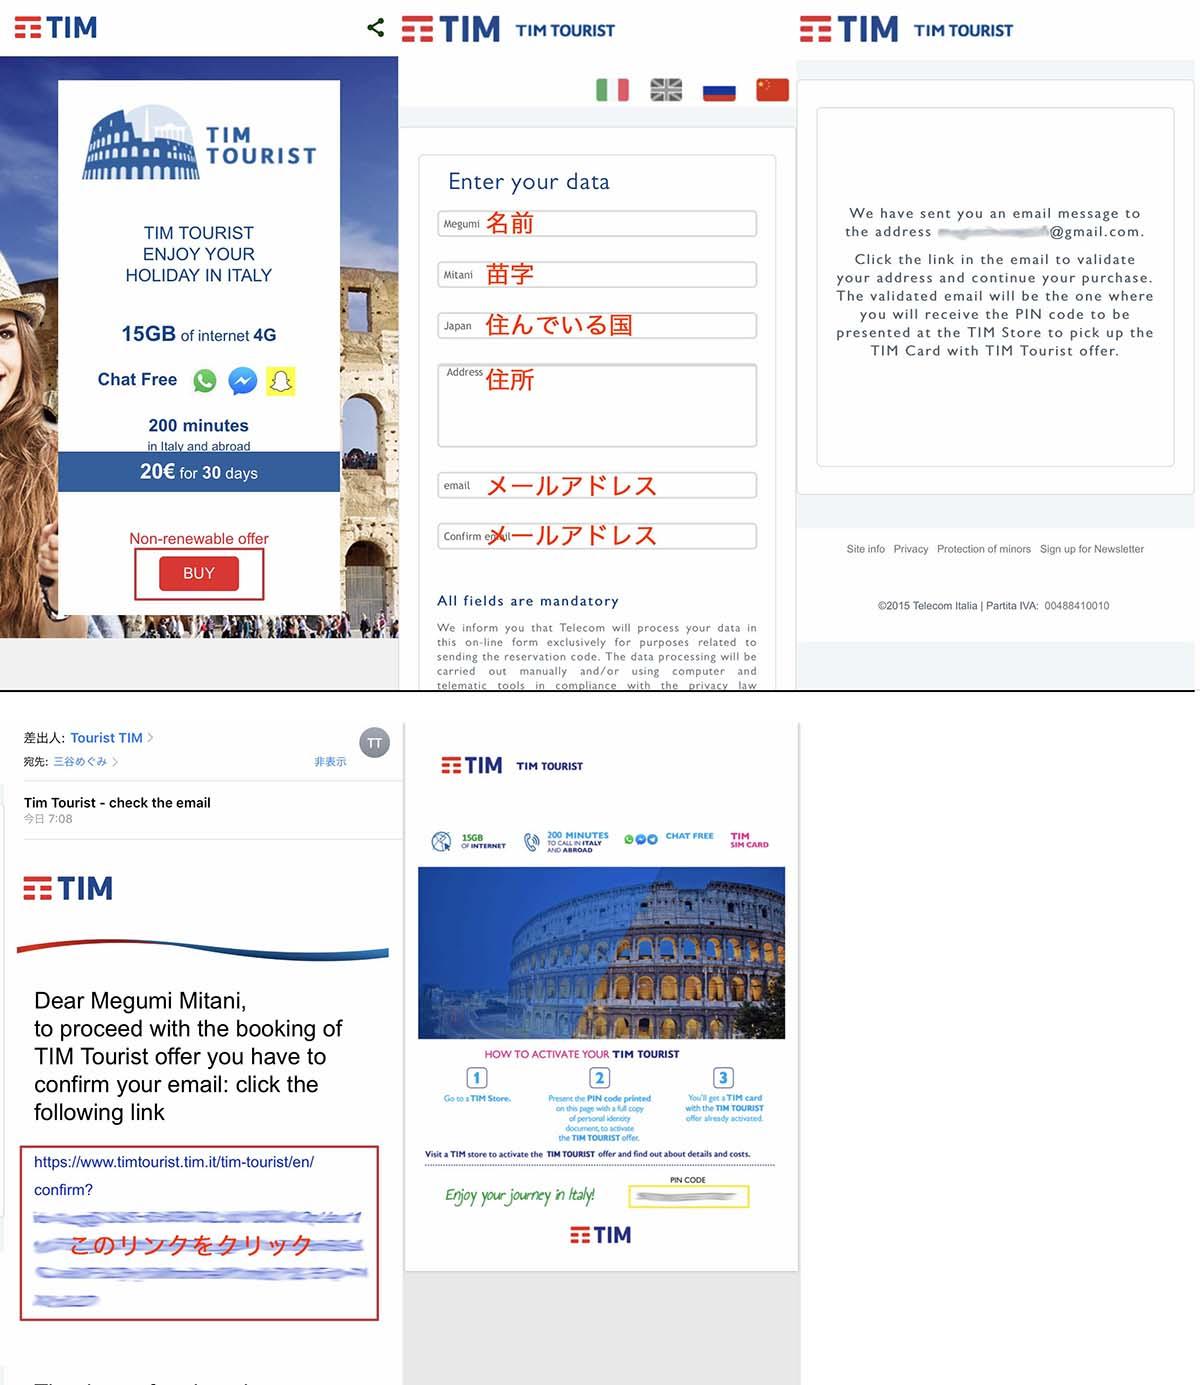 Italy-TIM-tourist-SIM(c)Megumi Mitani